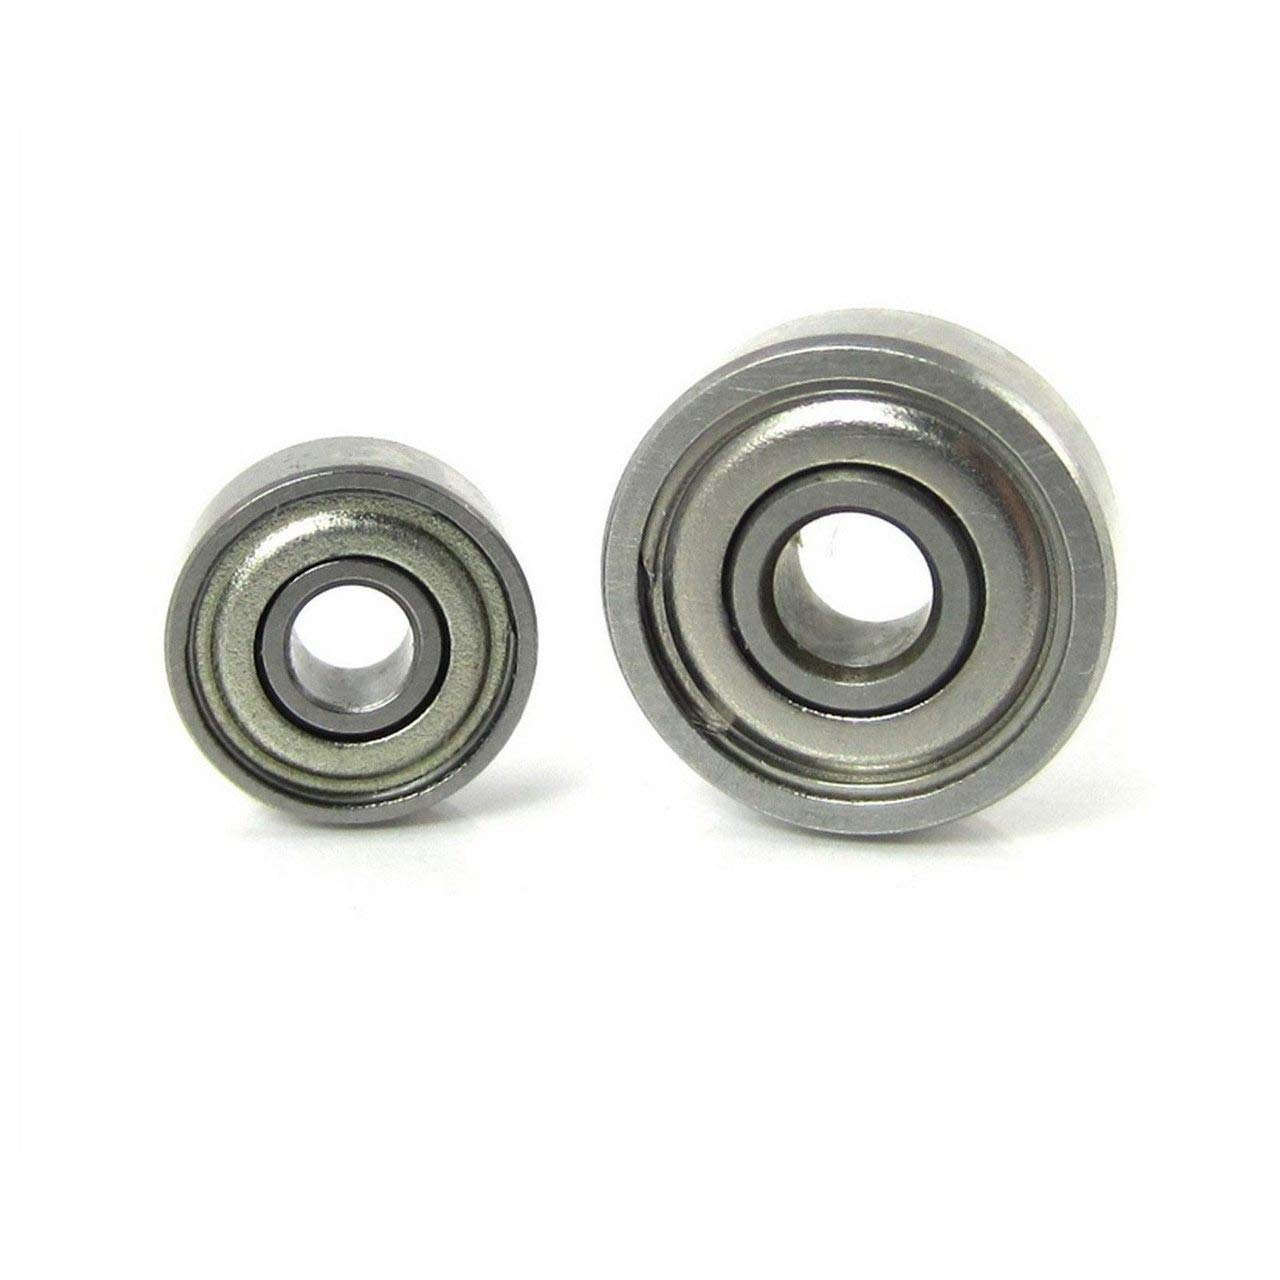 TRB RC 1//8x3//8x5//32 Stainless Hybrid Ceramic Brushless Motor Ball Bearing